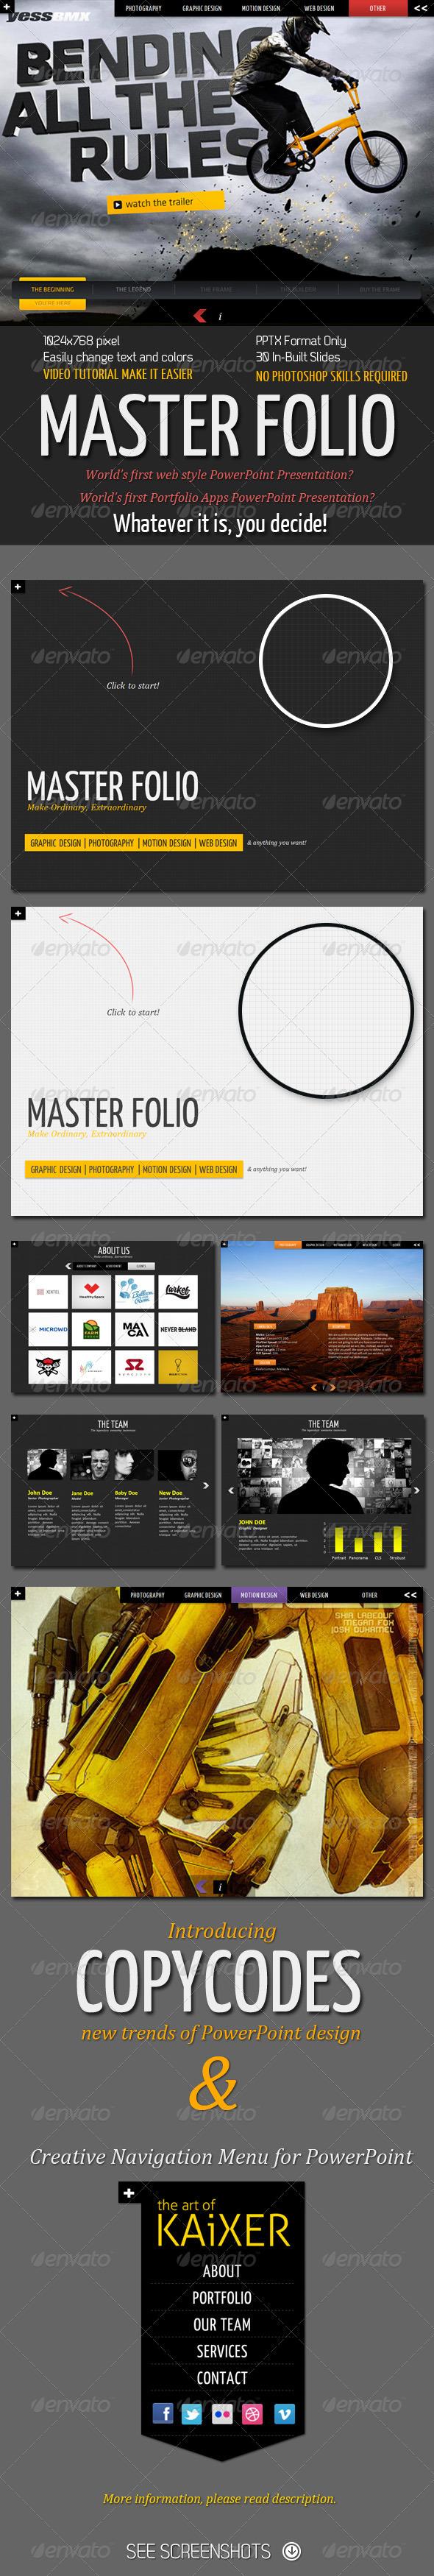 Master Folio PowerPoint Presentation